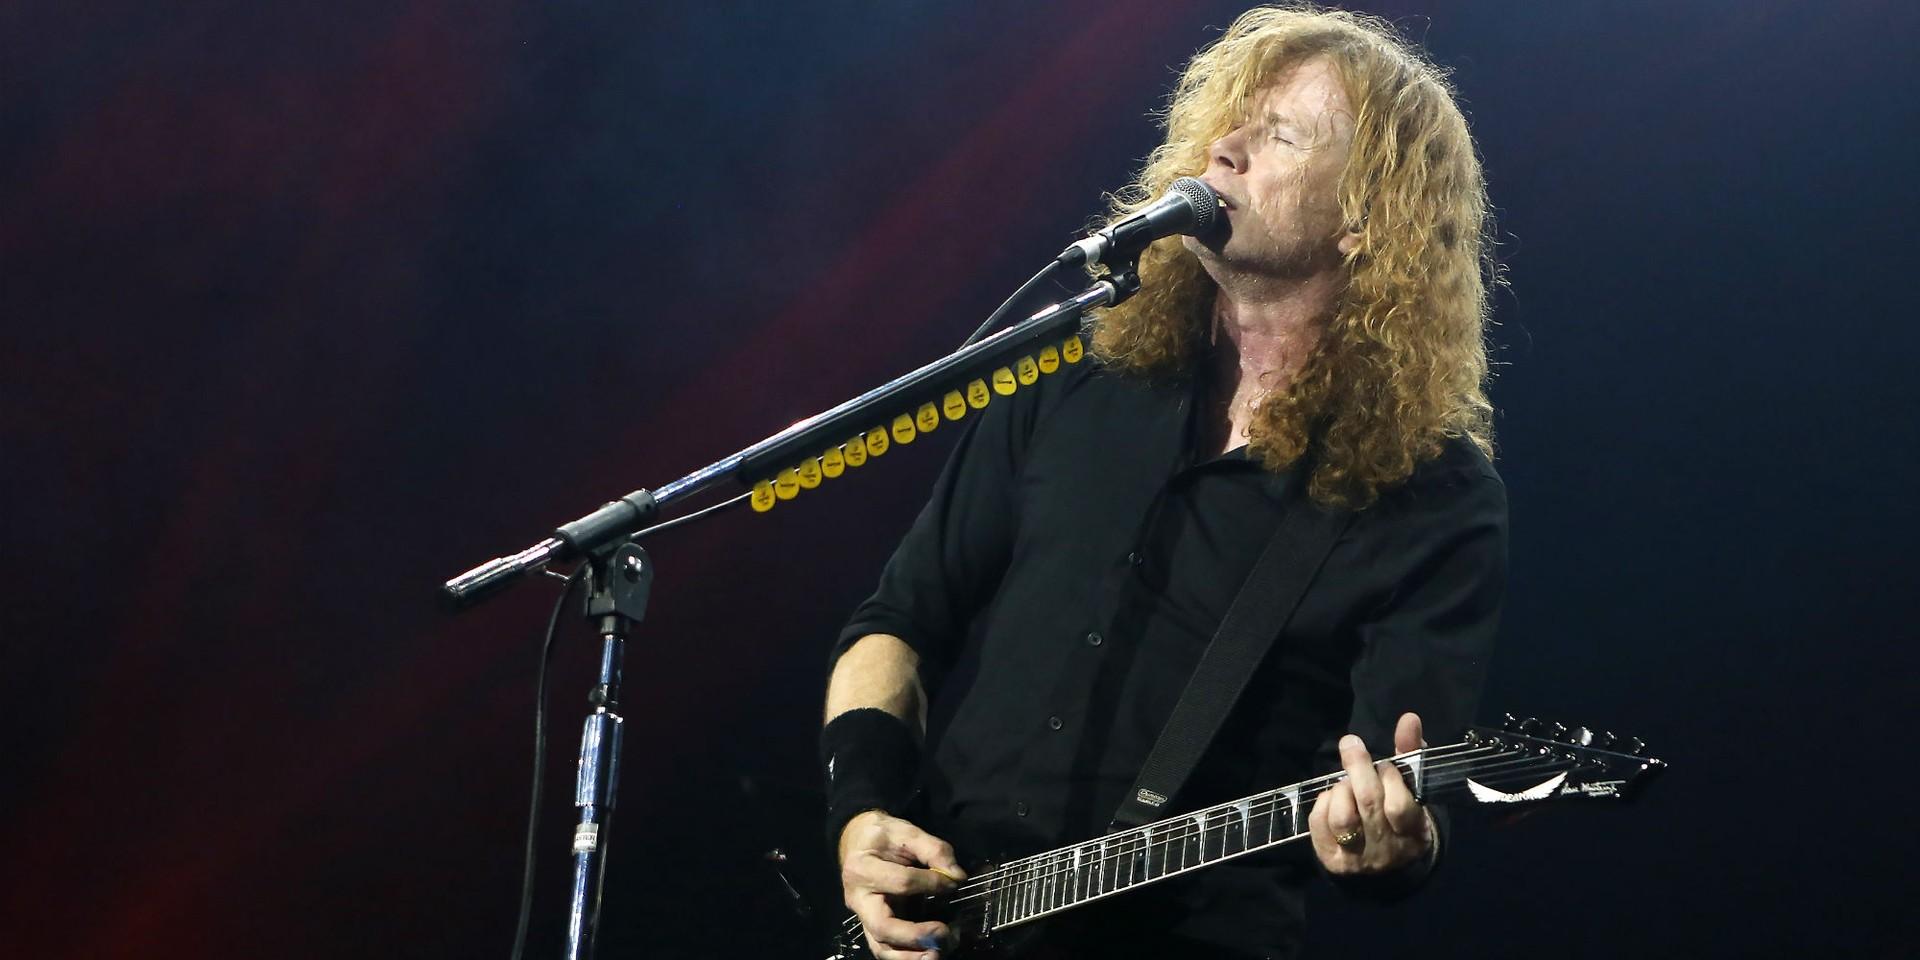 Megadeth's Dave Mustaine announces cancer diagnosis, shares album, tour updates